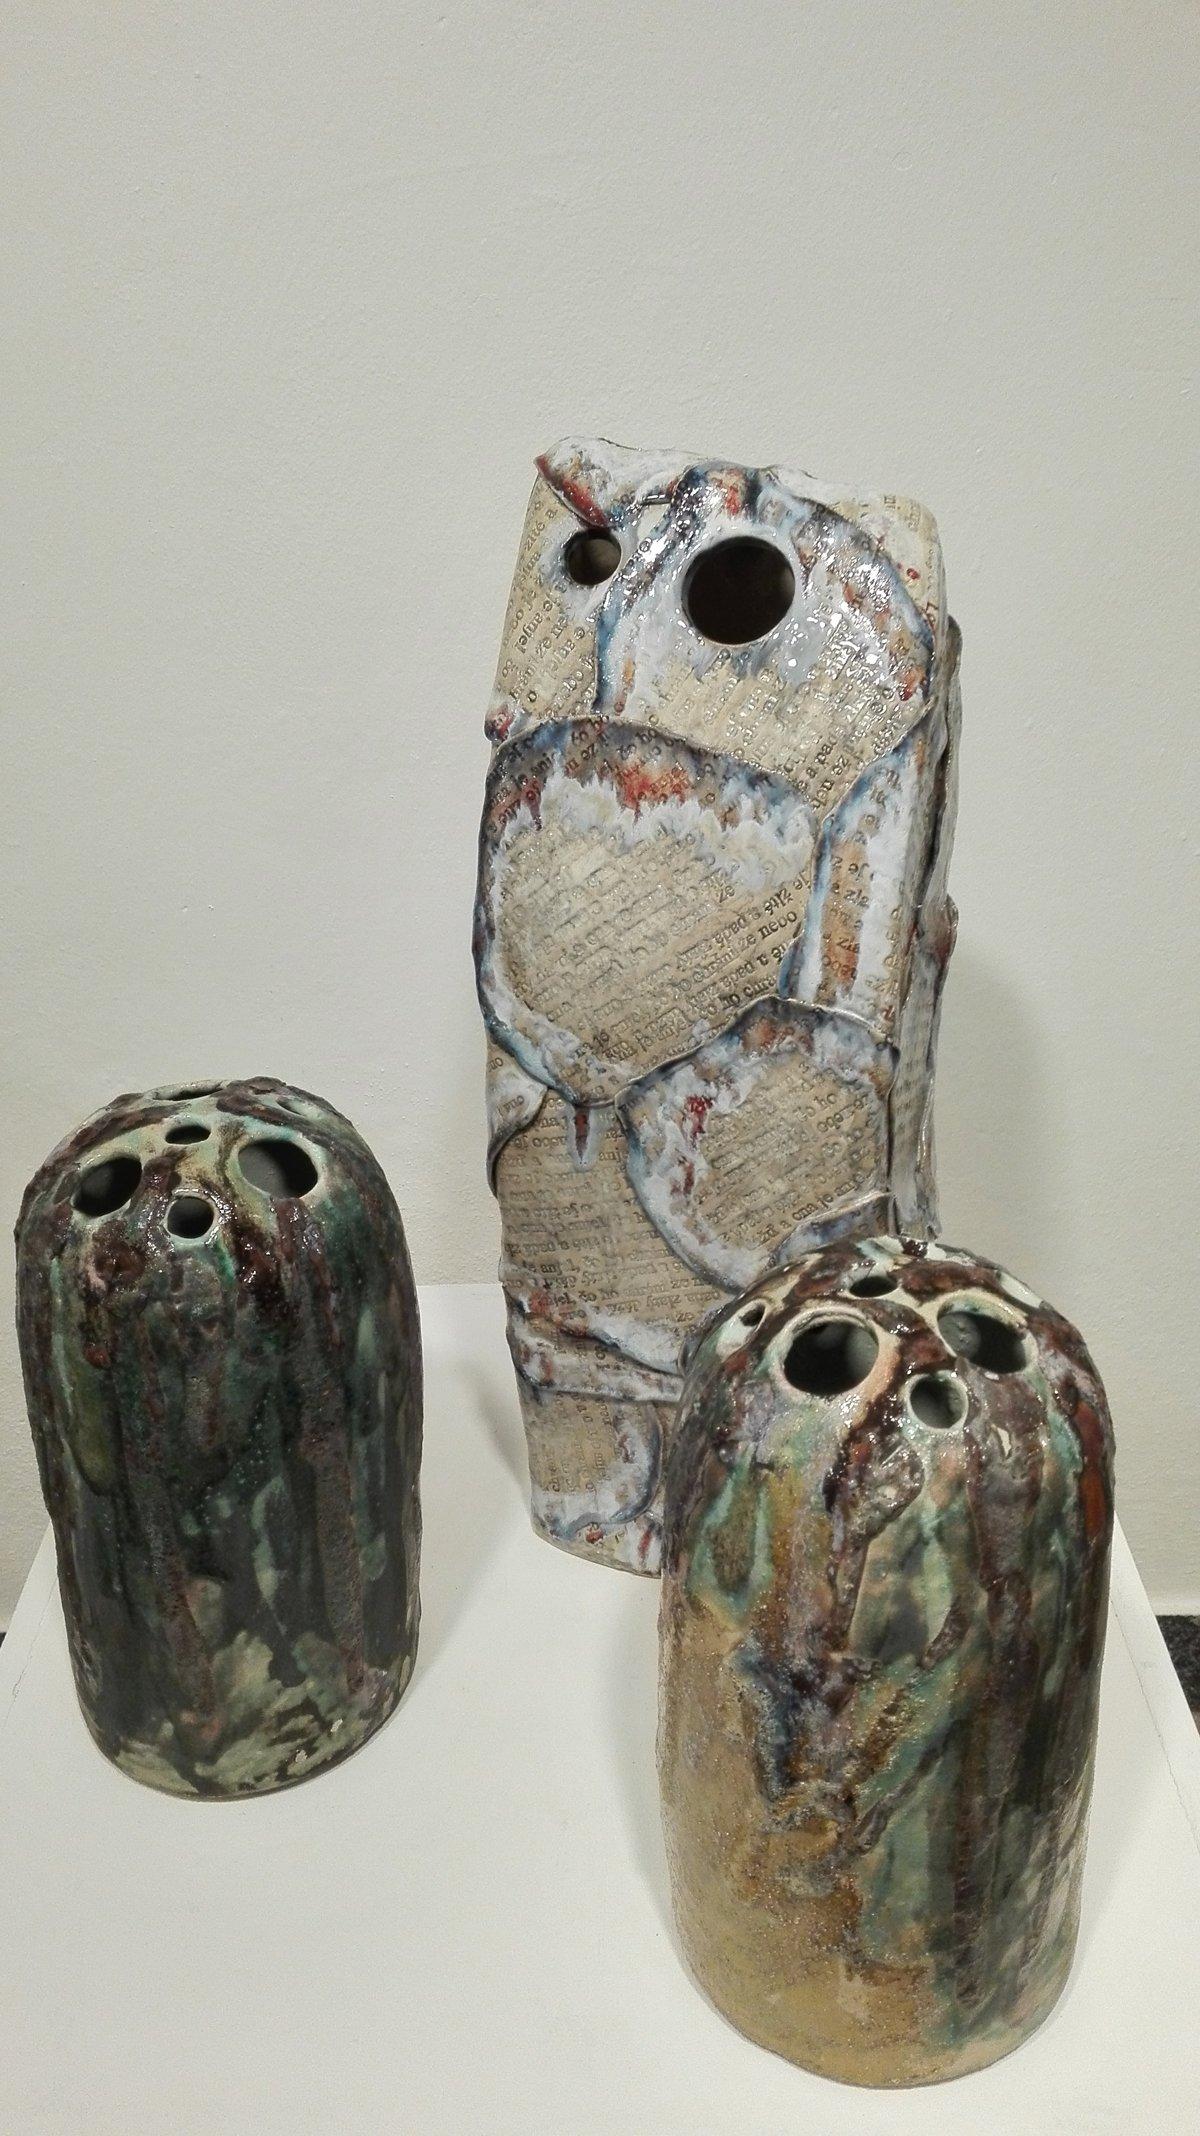 Skvosty z keramiky postavané na symbolike - spis.korzar.sme.sk e9b4af38c2